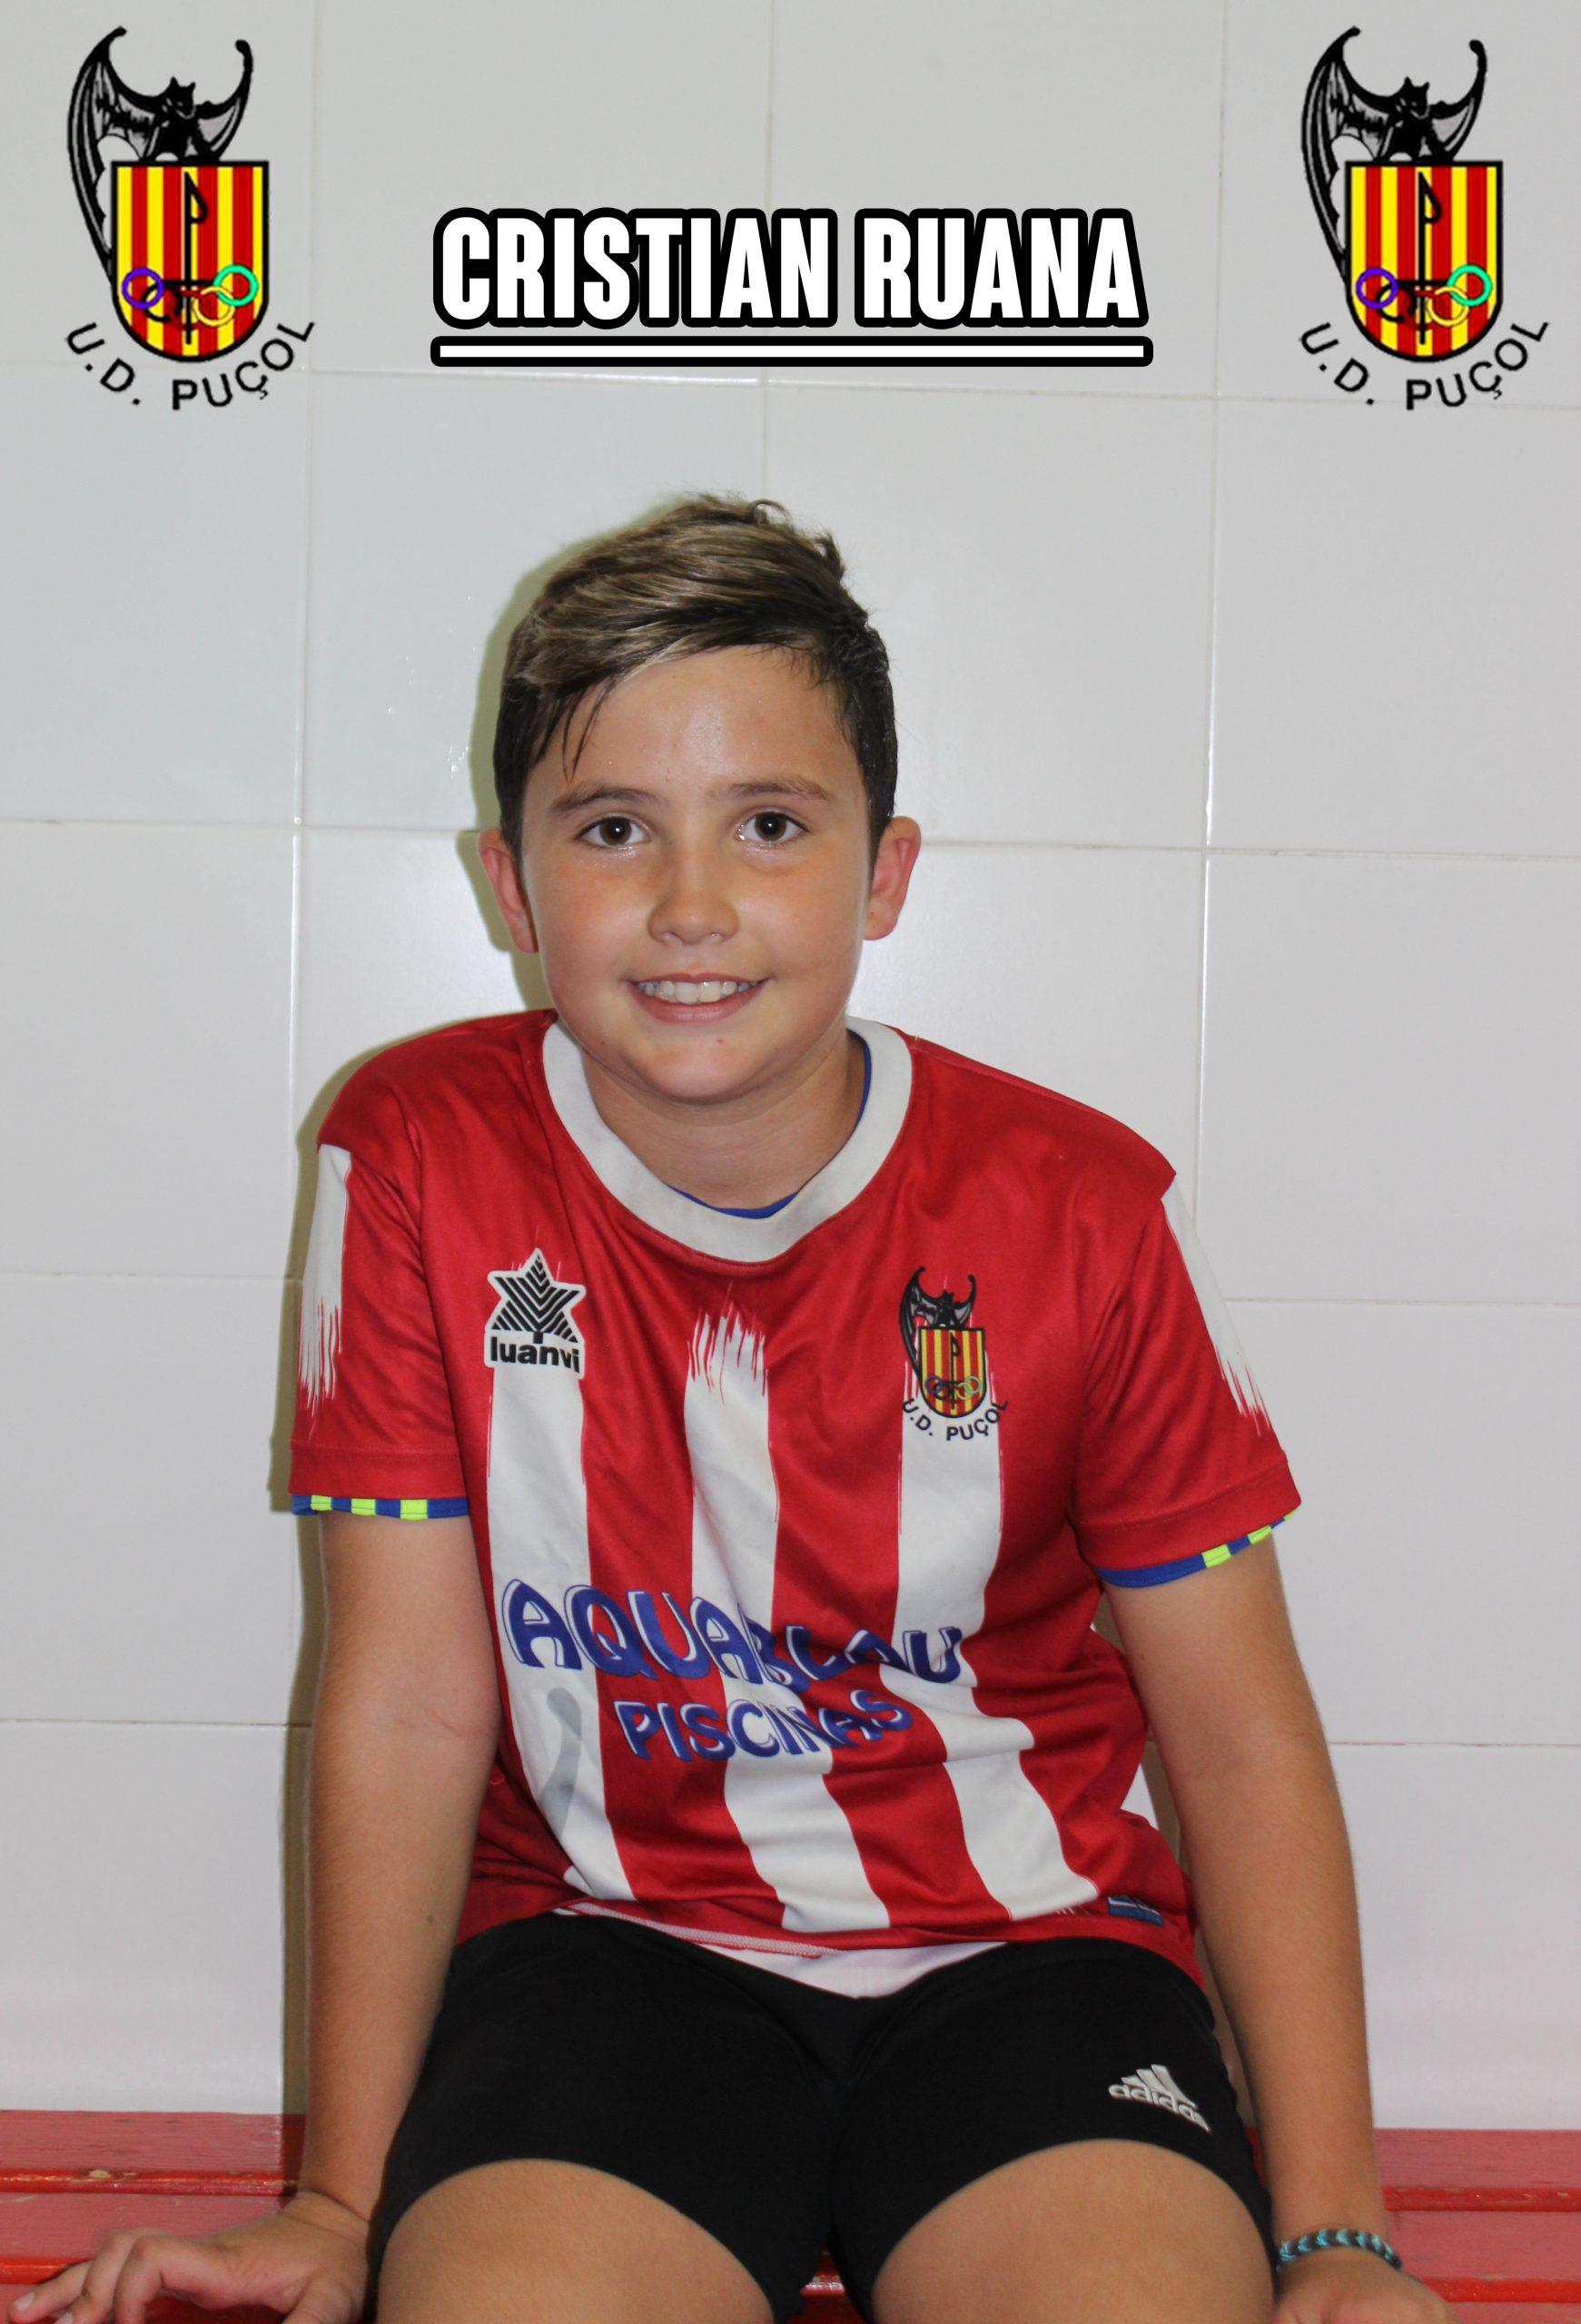 Cristian Ruana